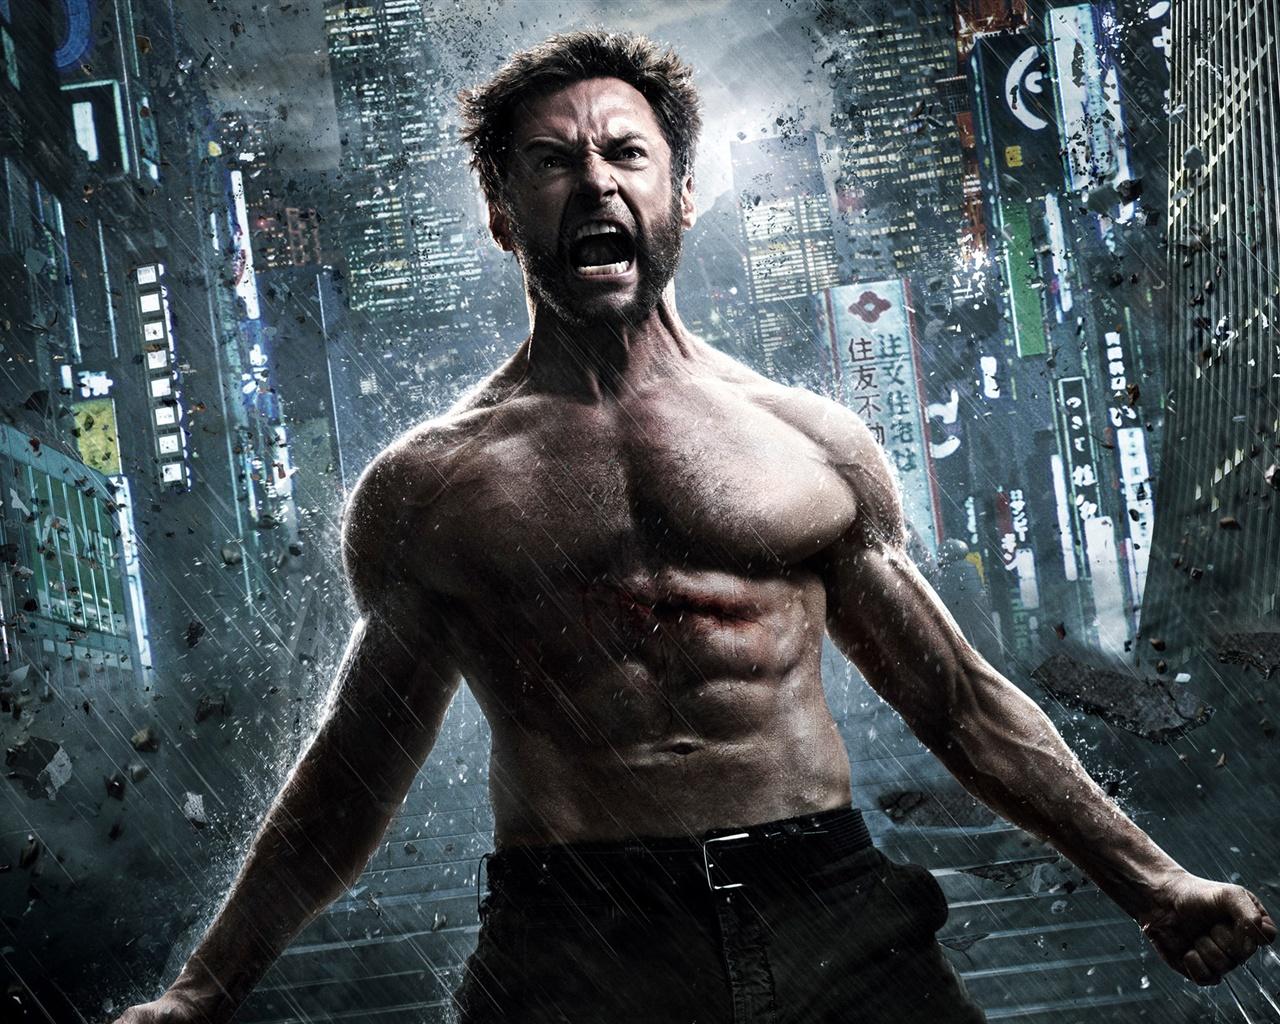 The Wolverine 2013: The Wolverine 2, Movie 2013 Wallpaper